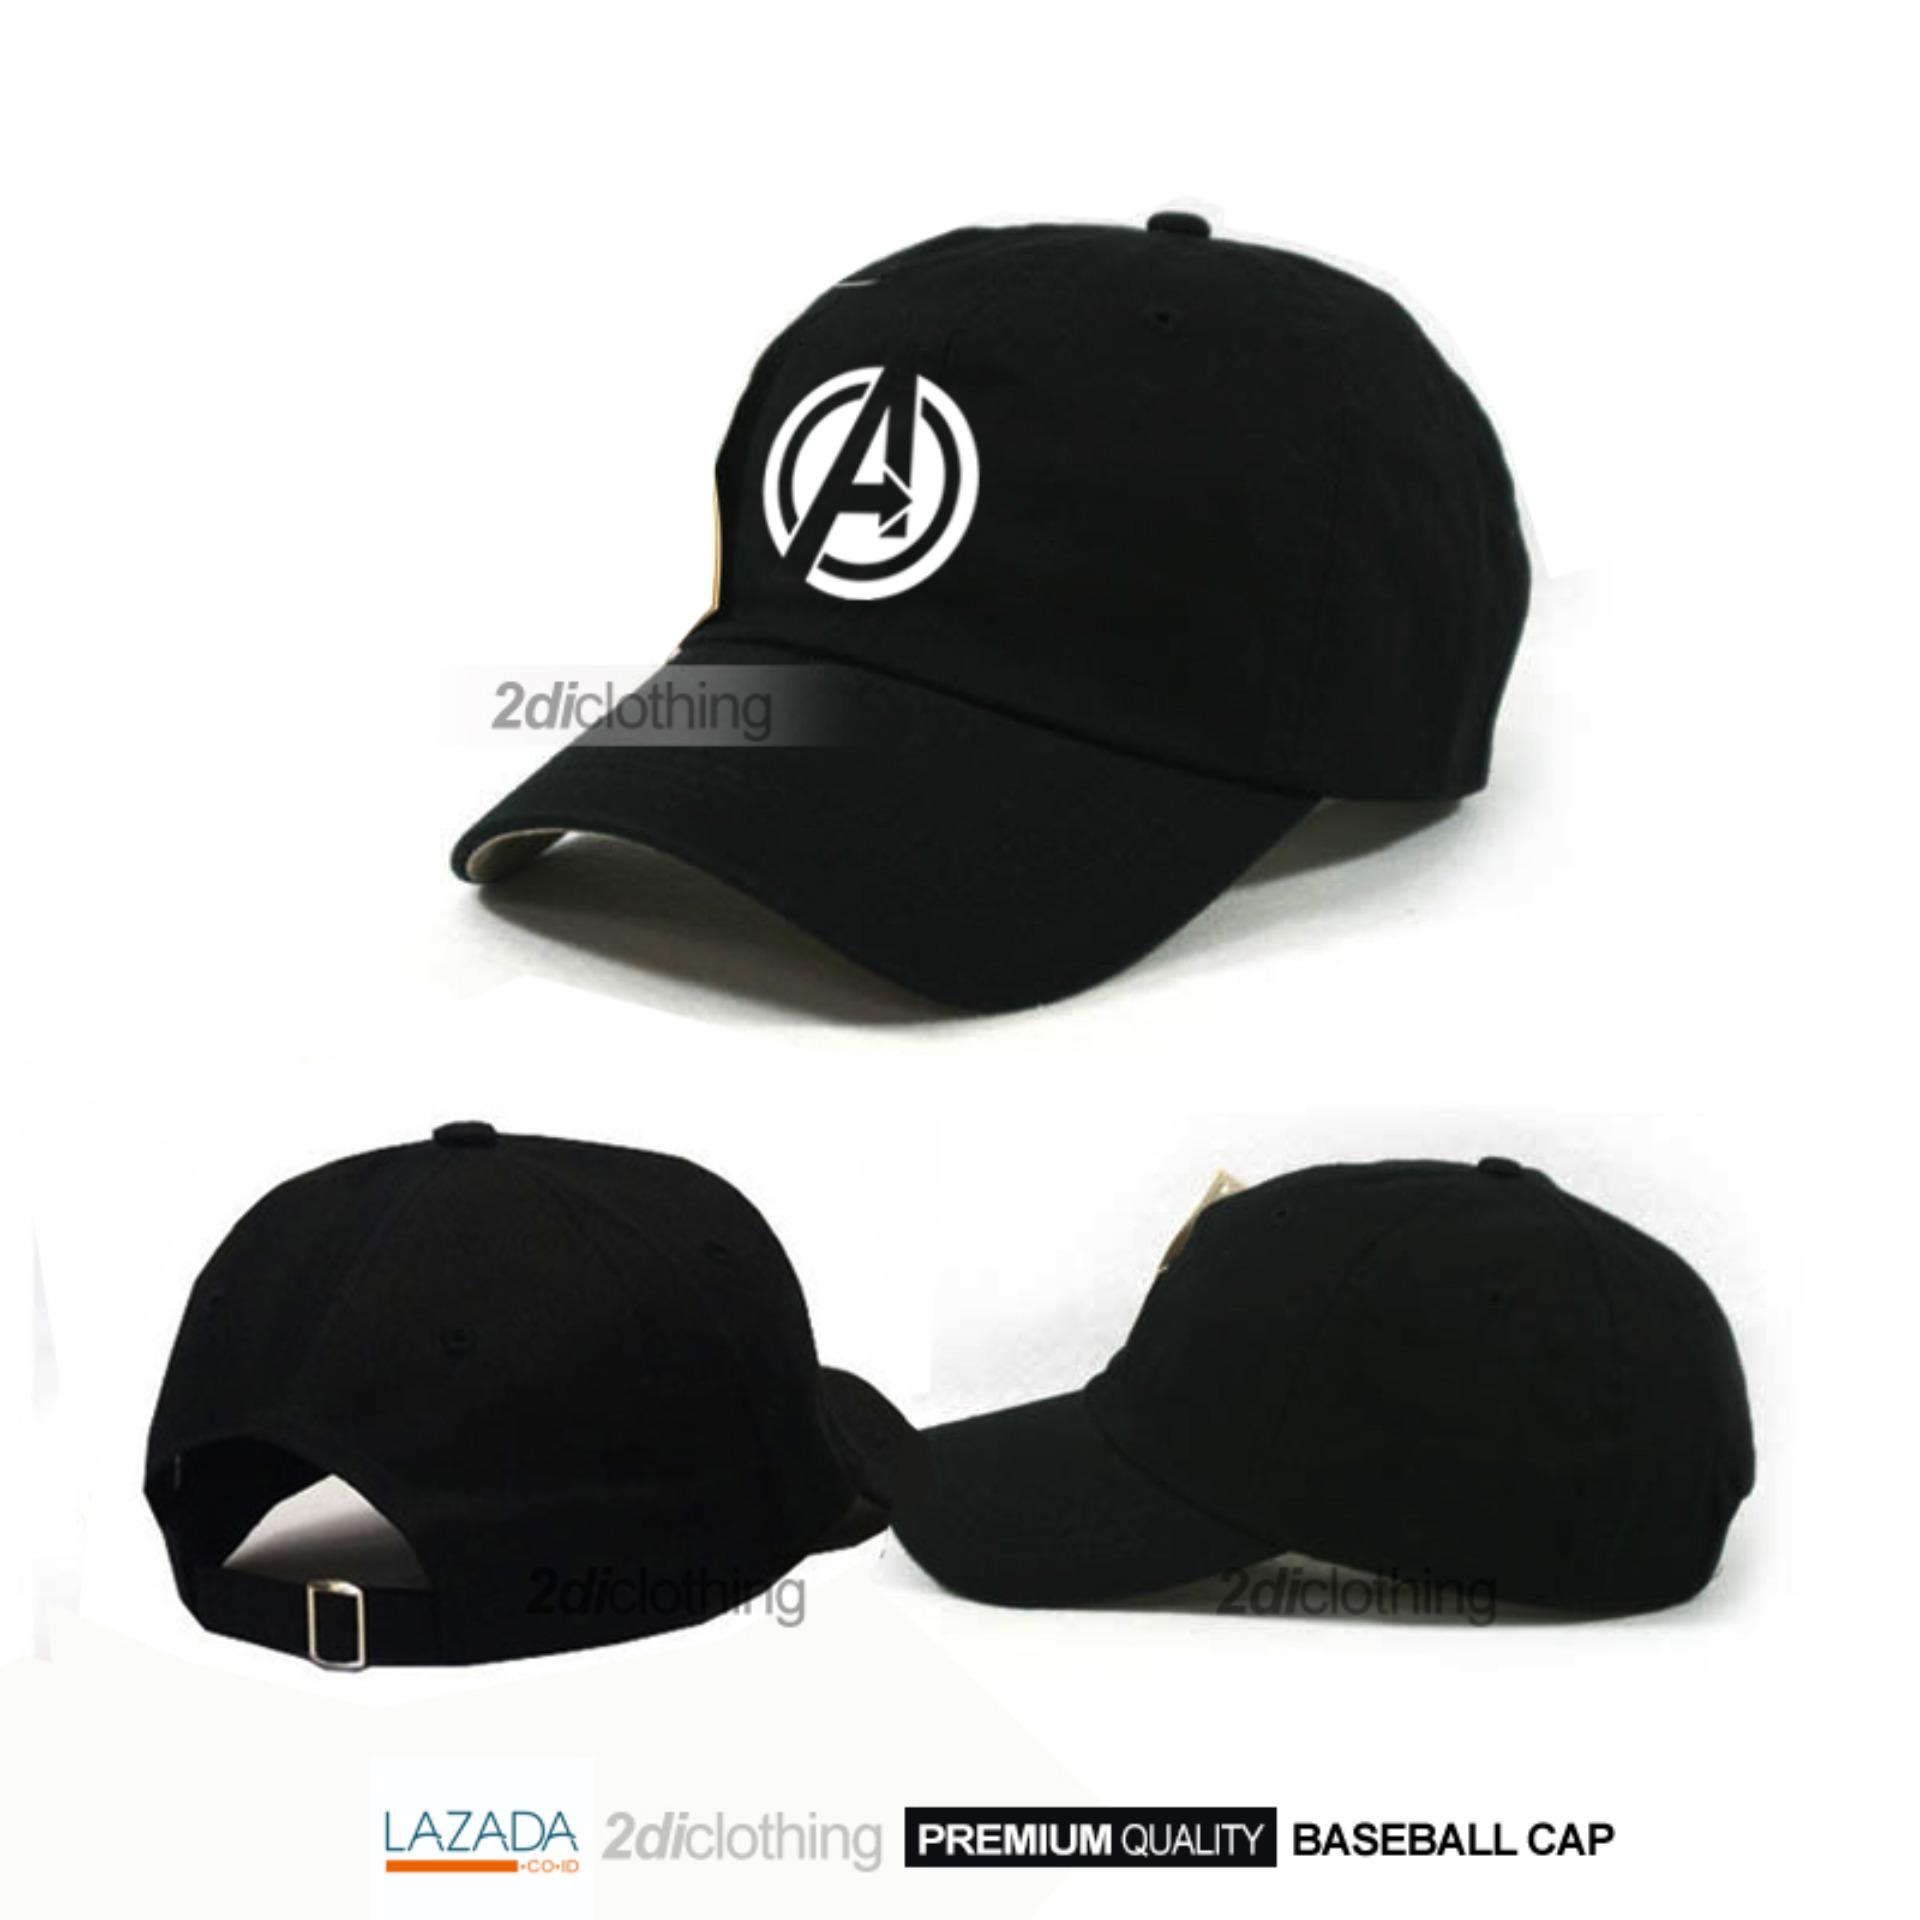 c61c08aa3 Cek Harga Baru Polo Cap Dad Hat Baseball Cap Topi Wadezig Topi ...